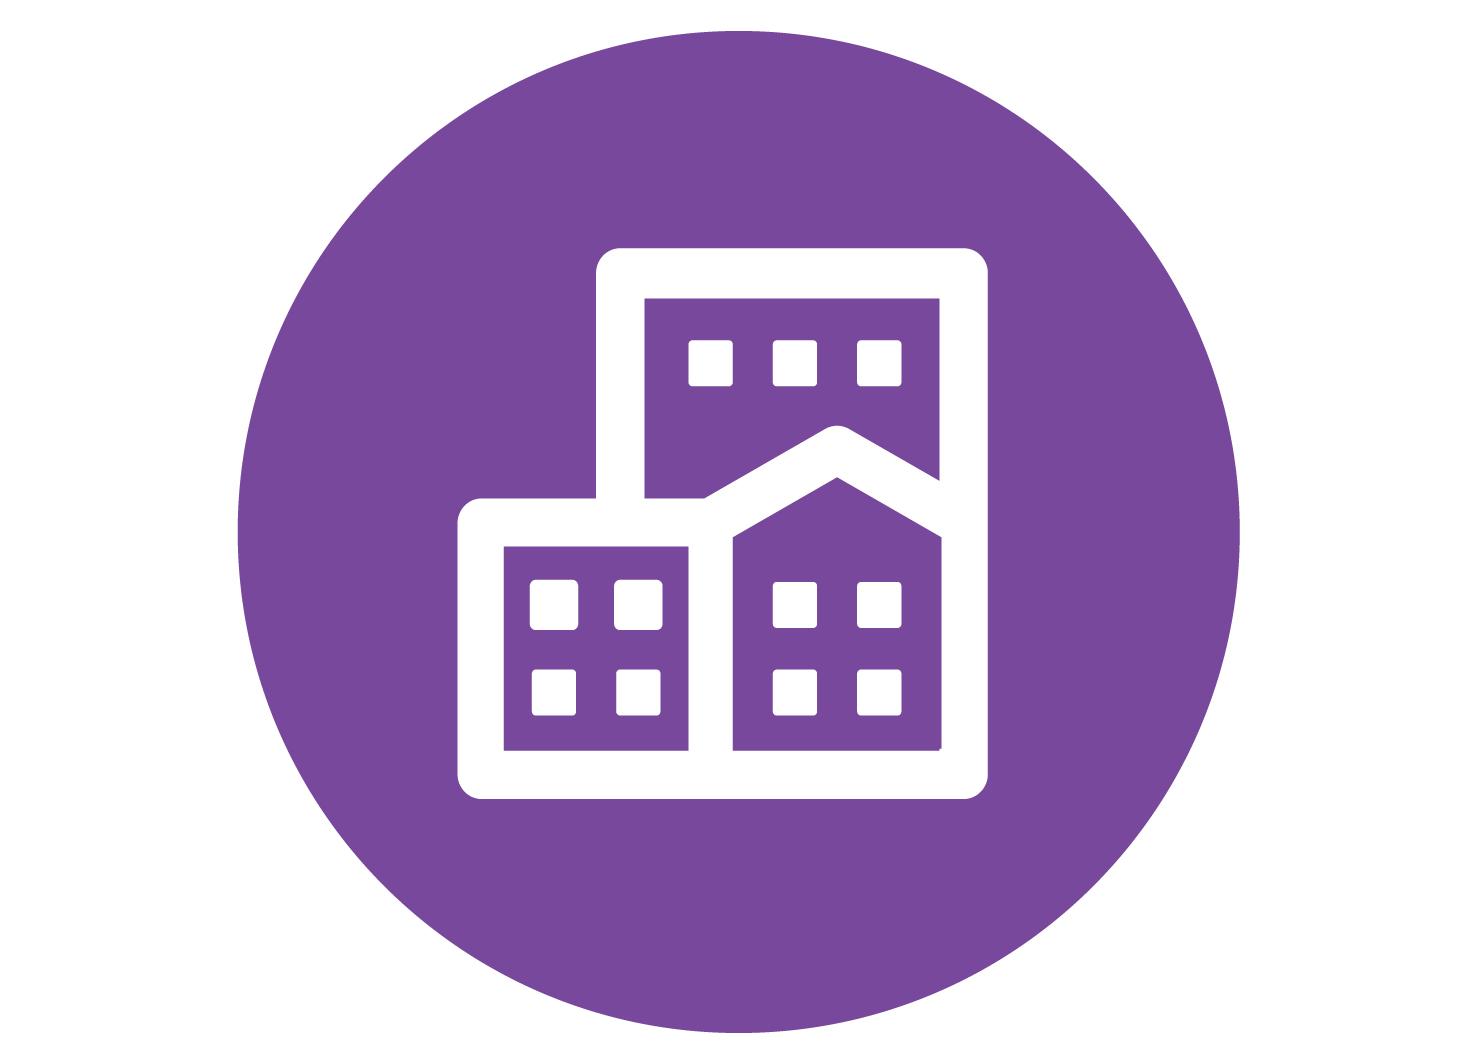 salescandy-lms-industry-real-estate.jpg